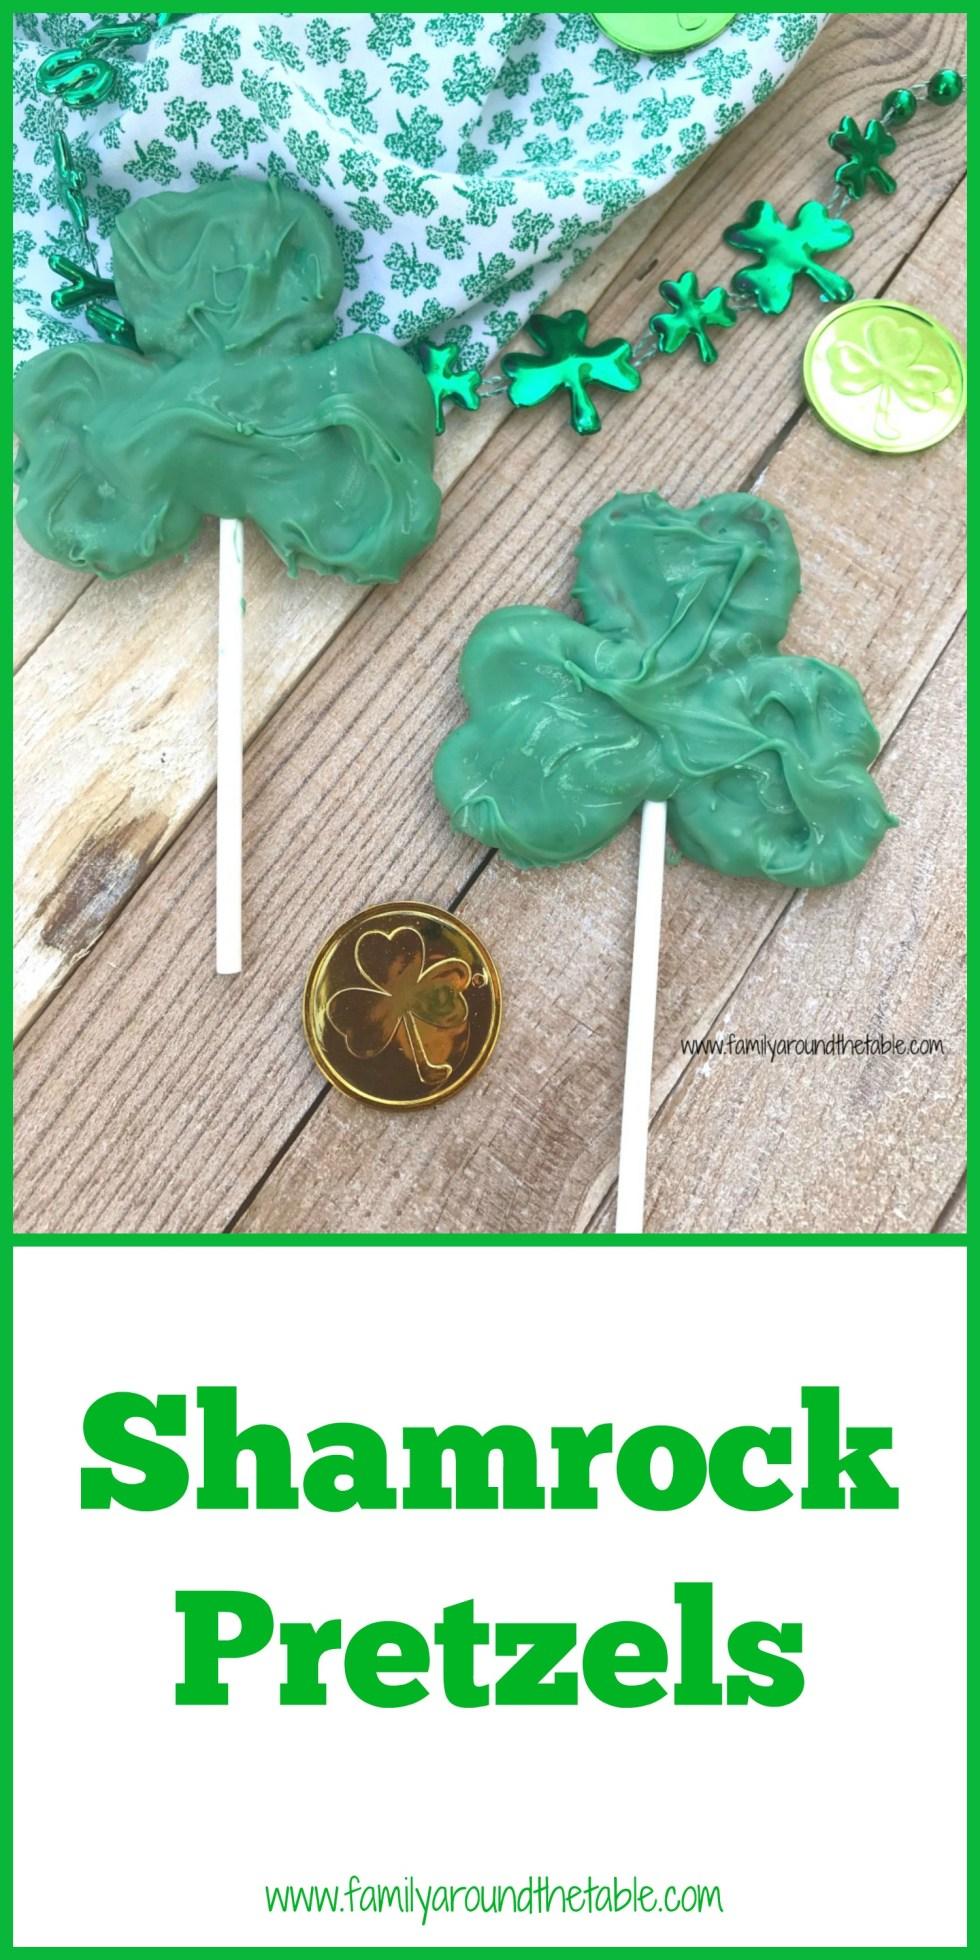 Pretzel shamrocks are a fun St. Patrick's Day treat.